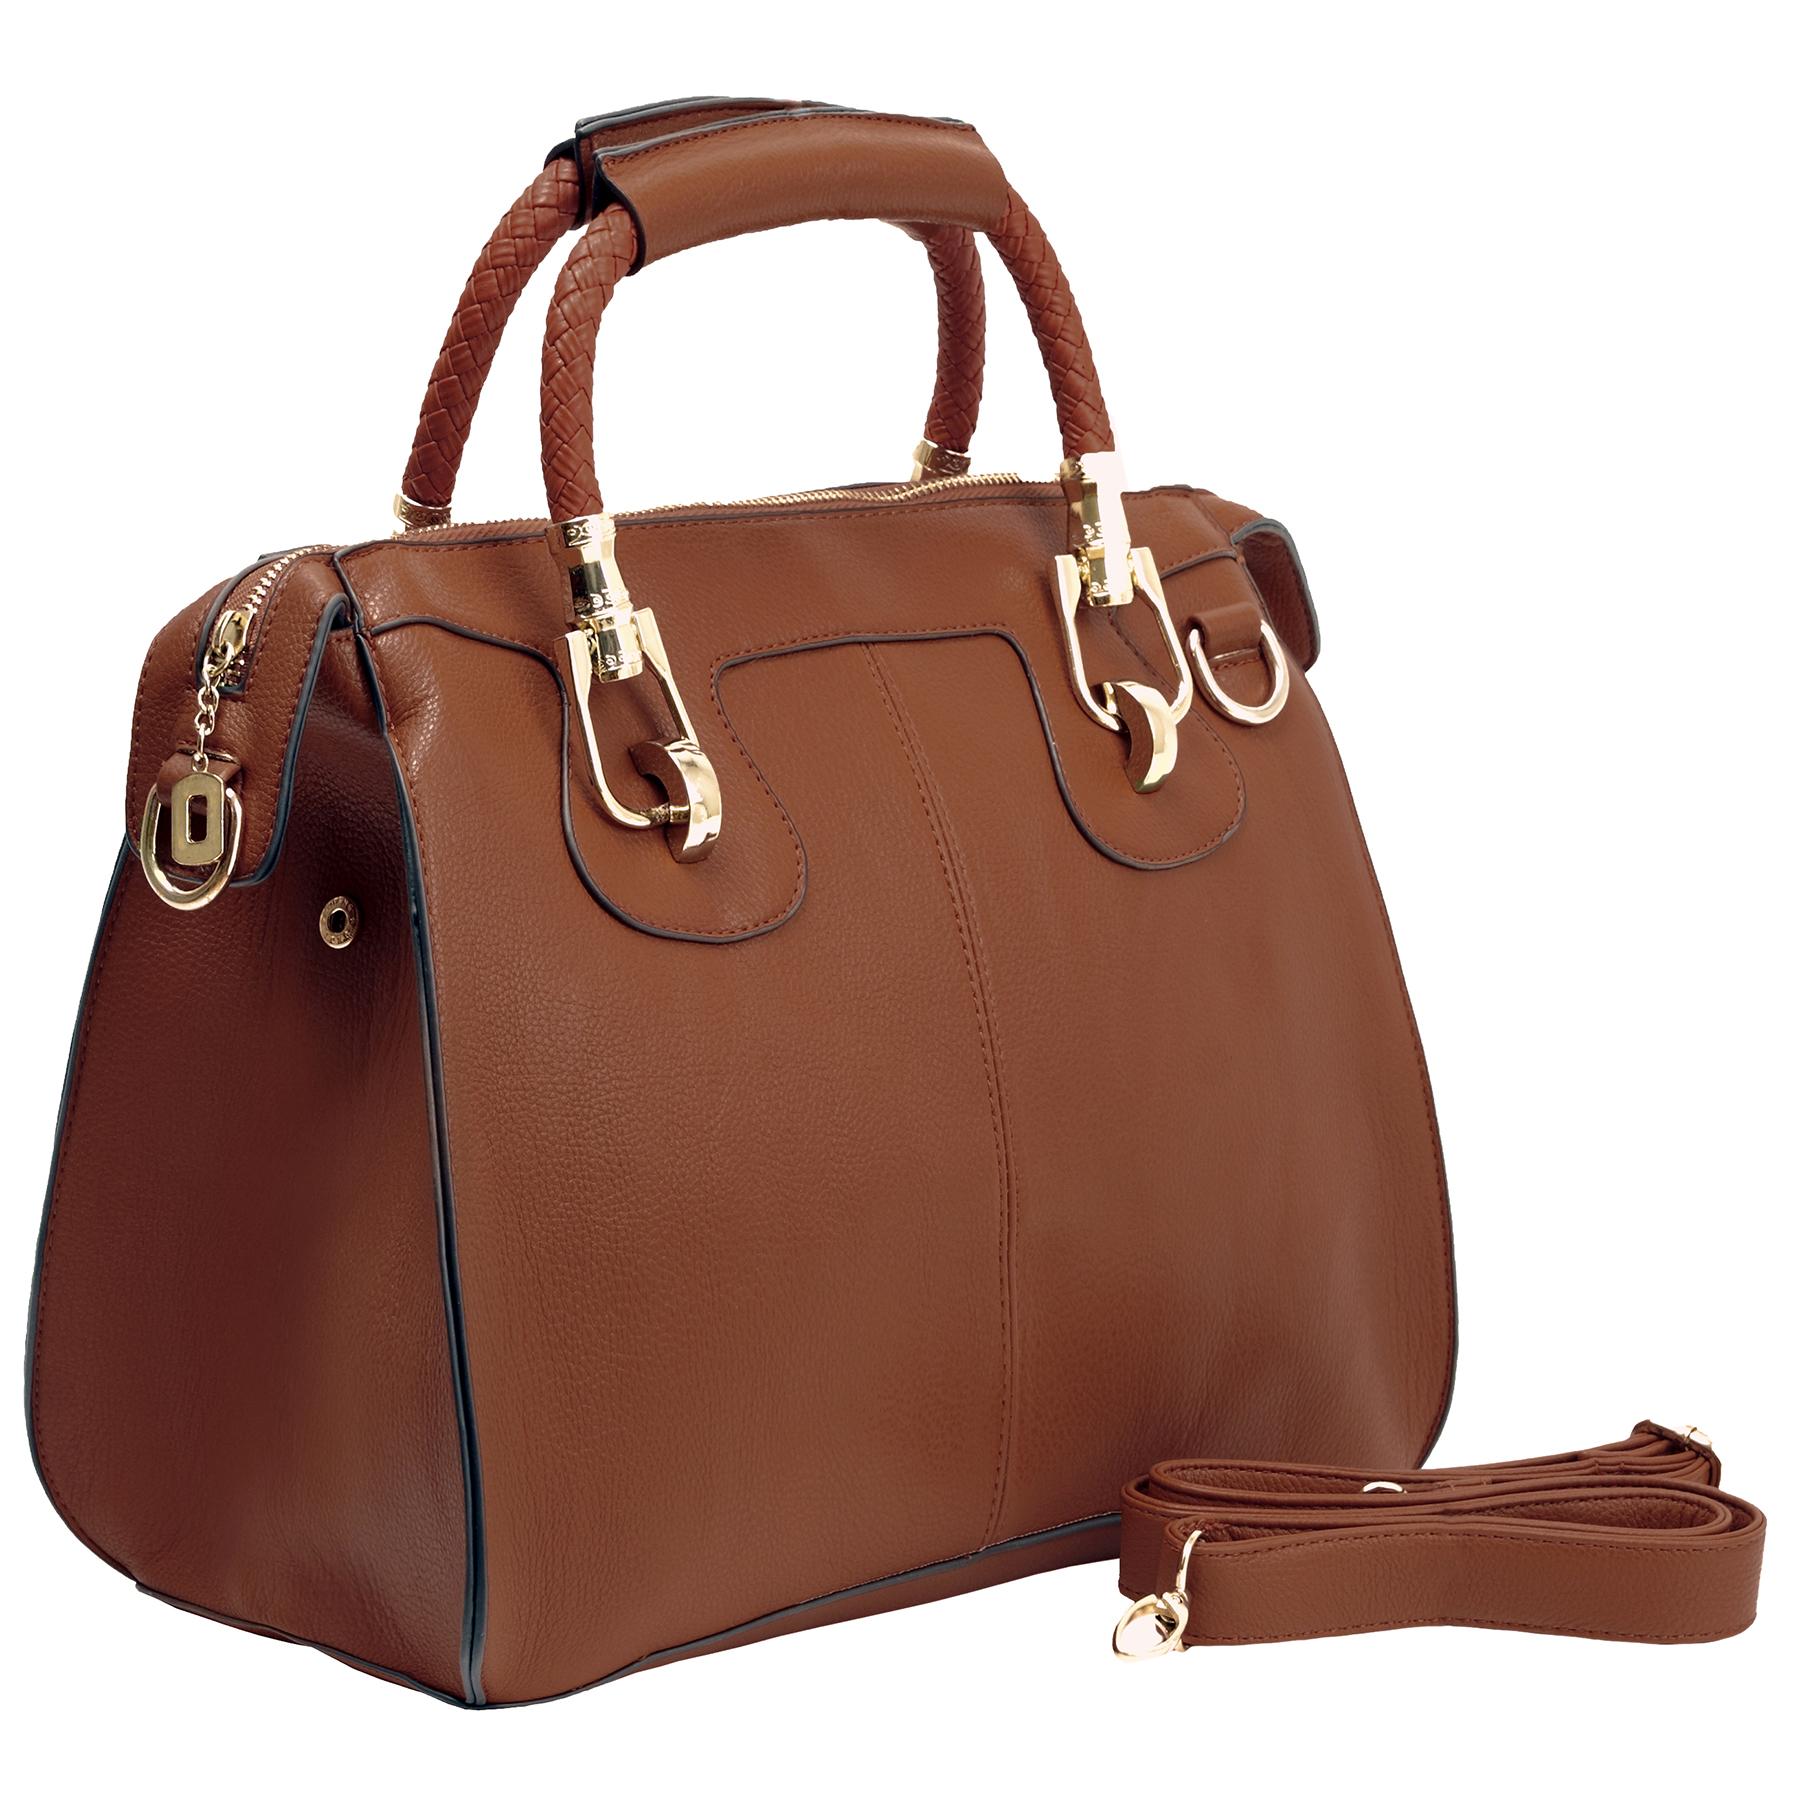 MARISSA Brown Doctor Style Handbag Main